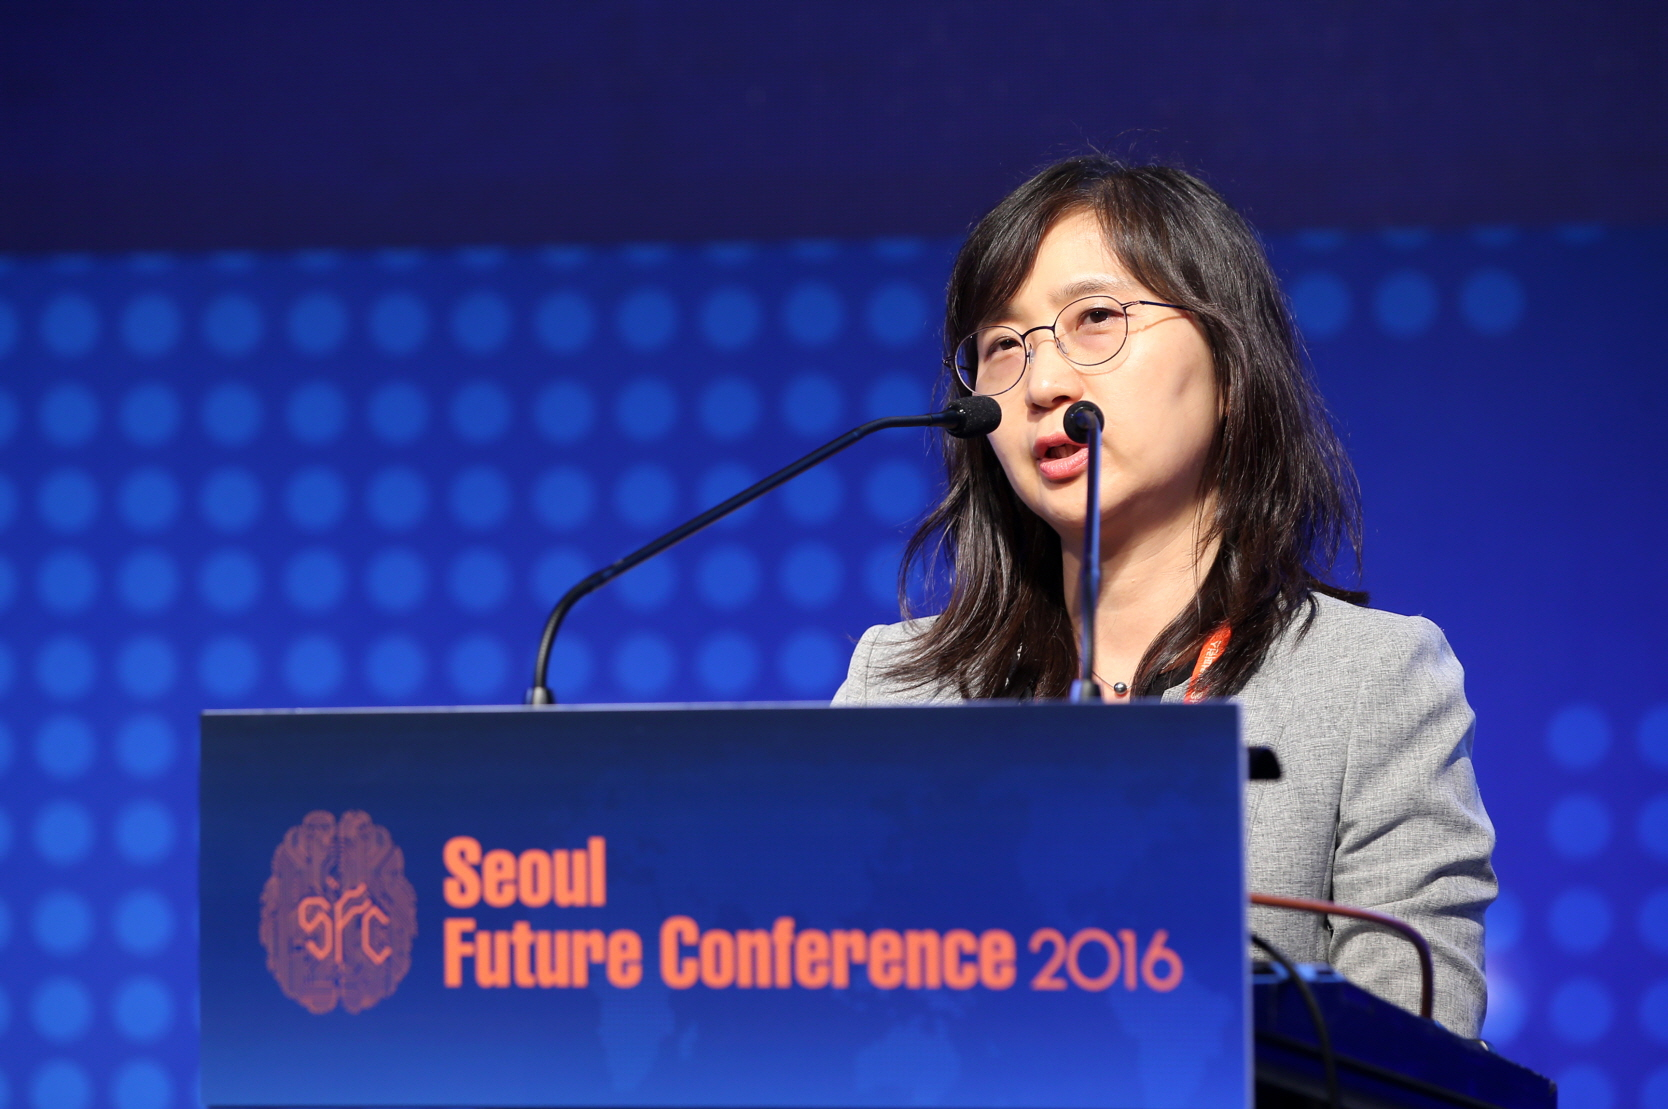 2016 SFC2016 SFC Session I 김지희 삼성전자 인공지능팀 상무